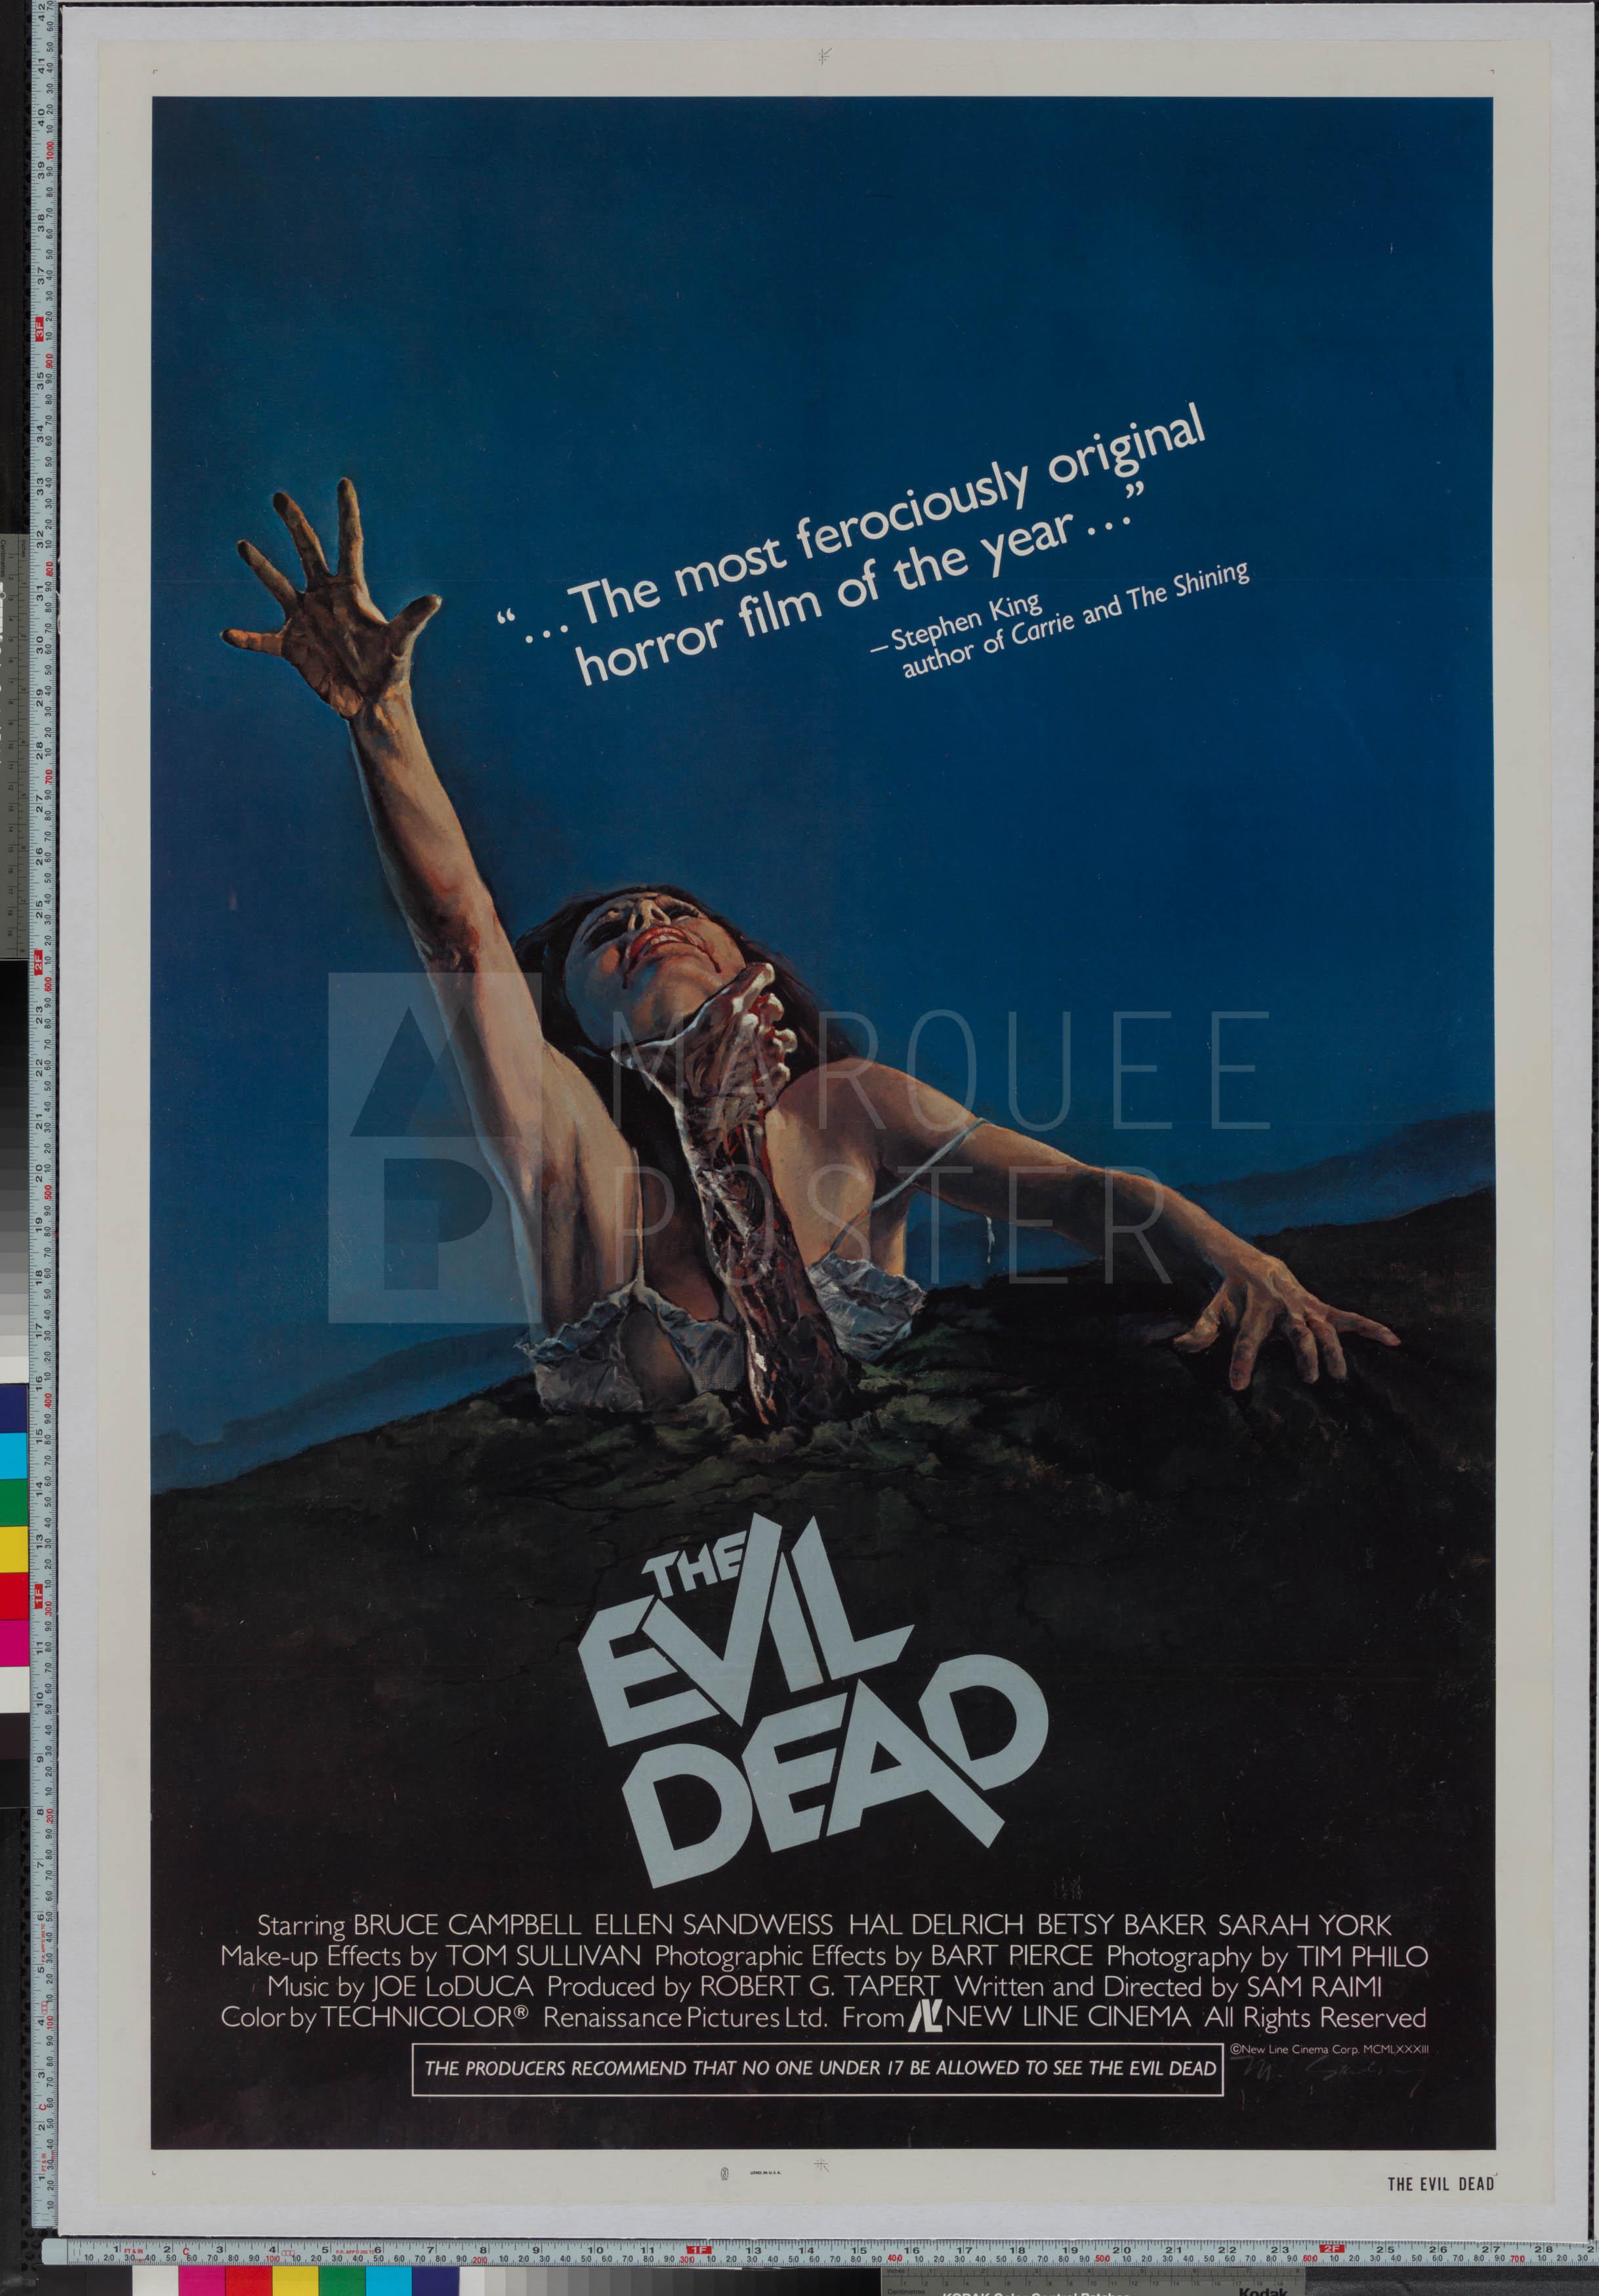 23-evil-dead-us-1-sheet-1983-02